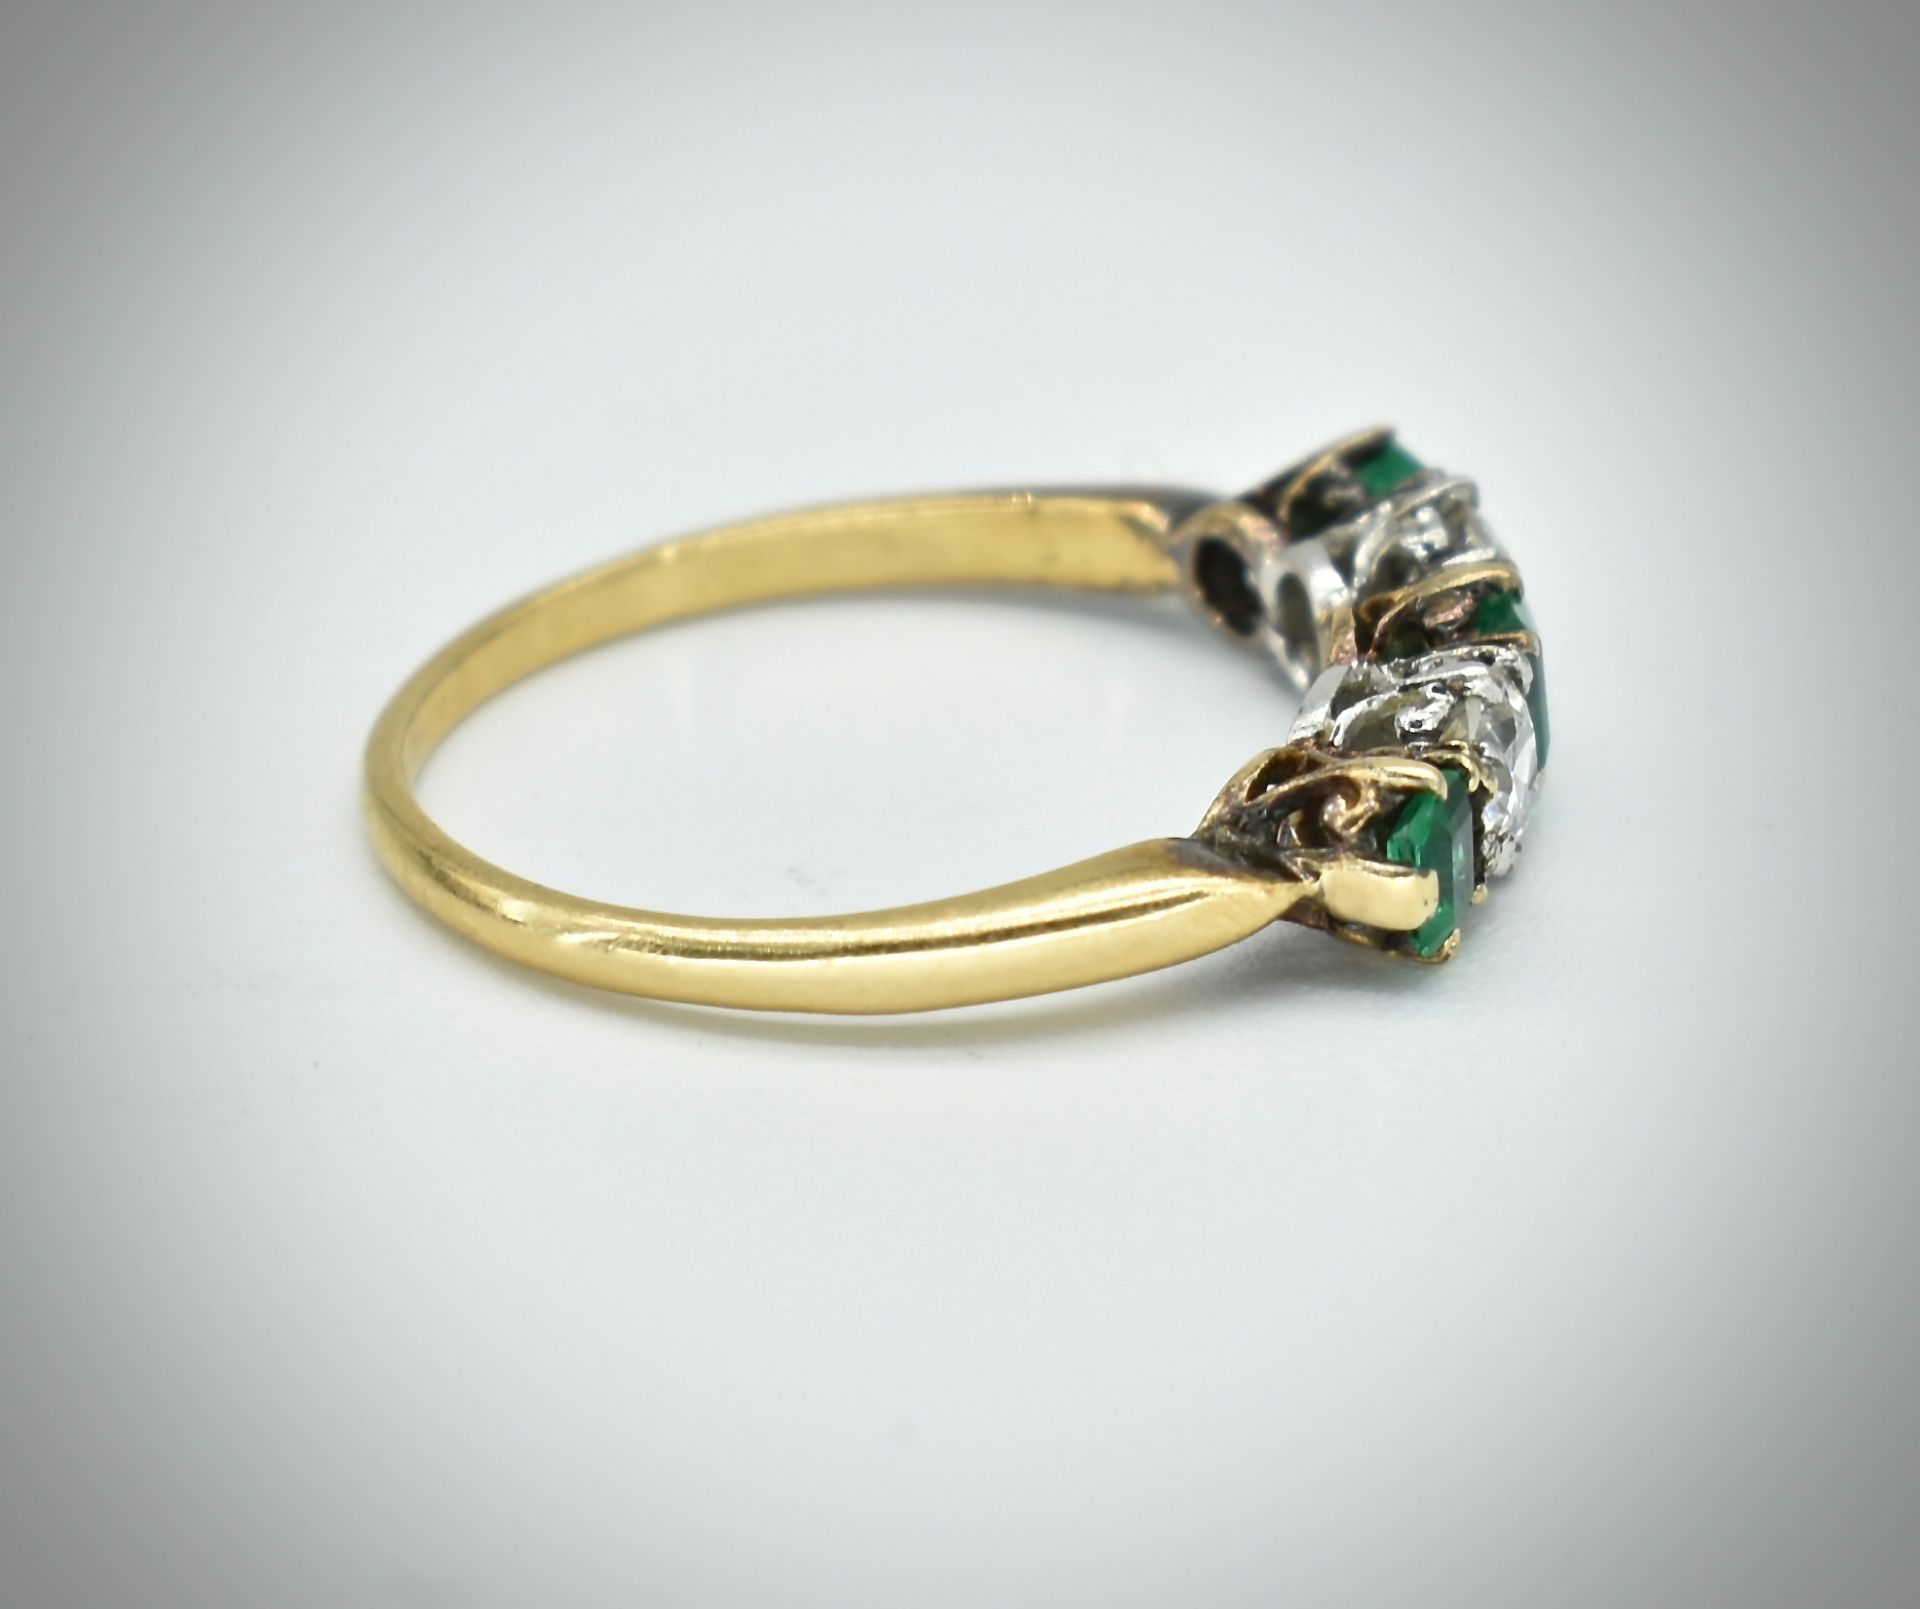 18ct Gold Emerald & Diamond Five Stone Ring - Image 5 of 7